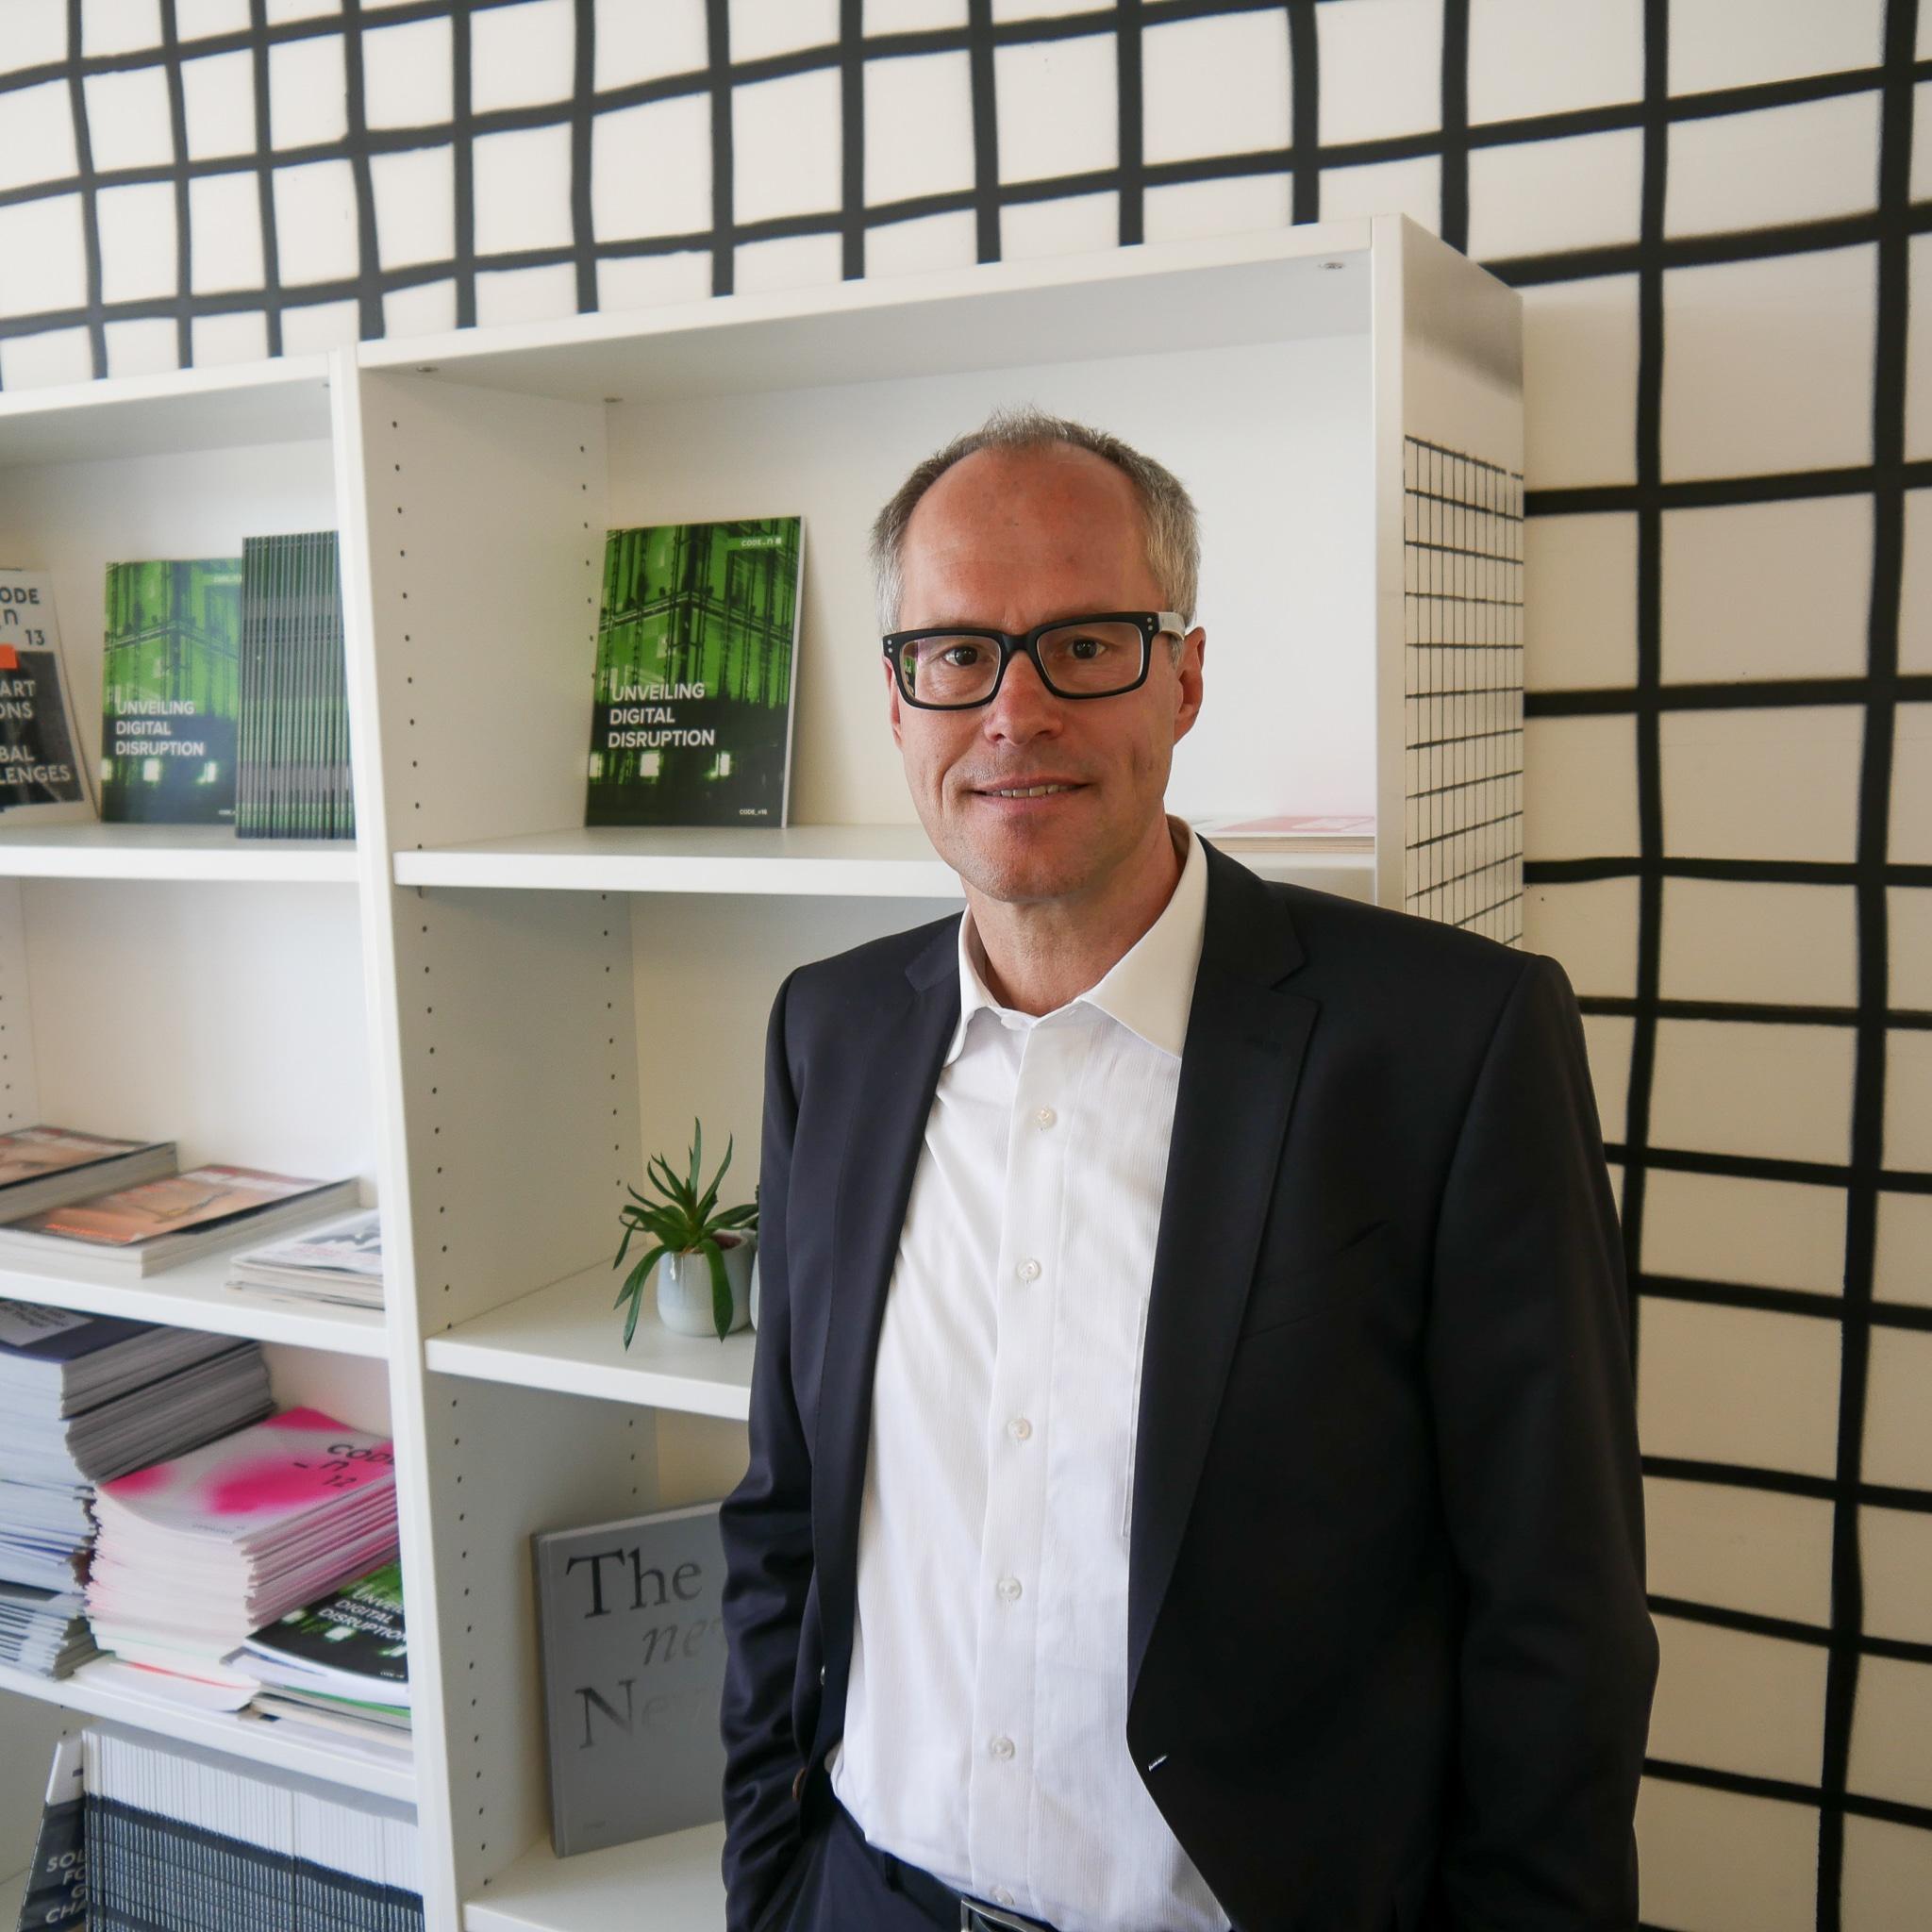 Managing Director CODE_n GmbH